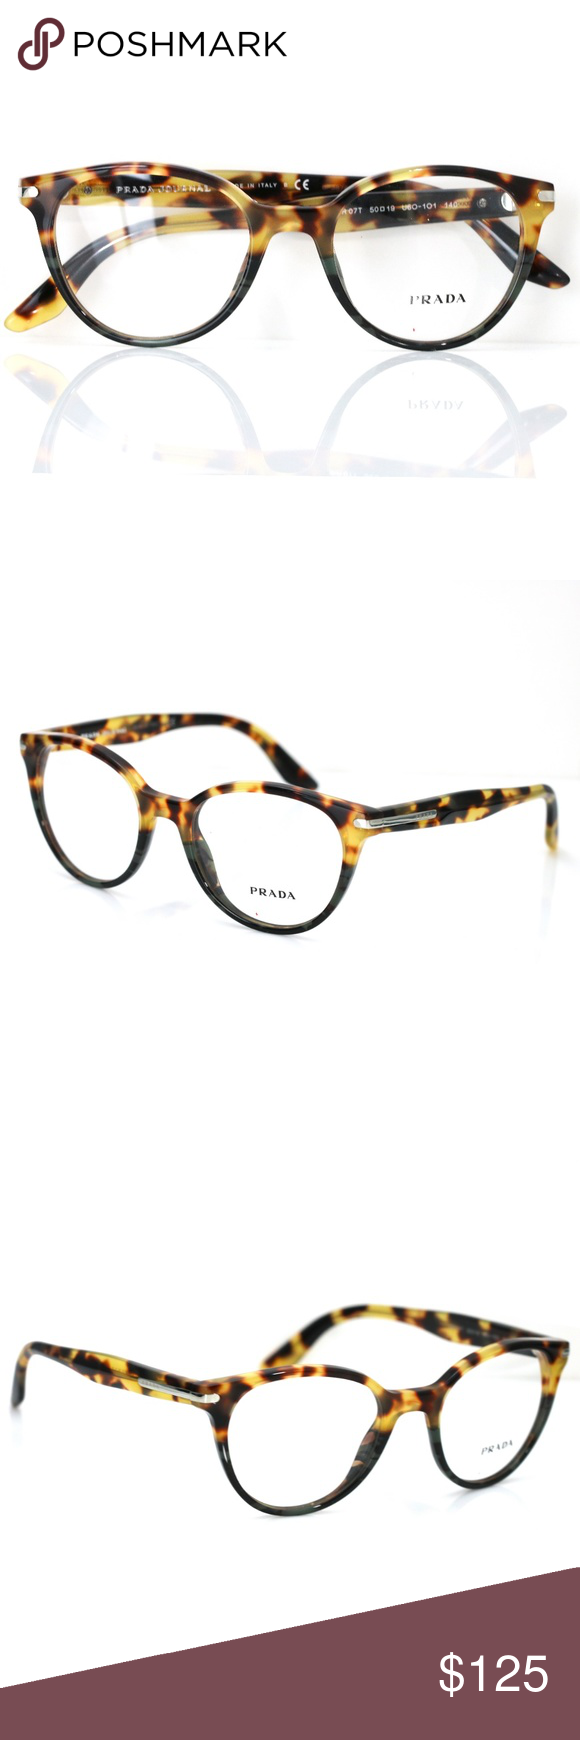 3c005a18d158 Prada Optical Eyeglasses 07T Havana frame New Comes with Prada case. Authentic  Prada Accessories Glasses